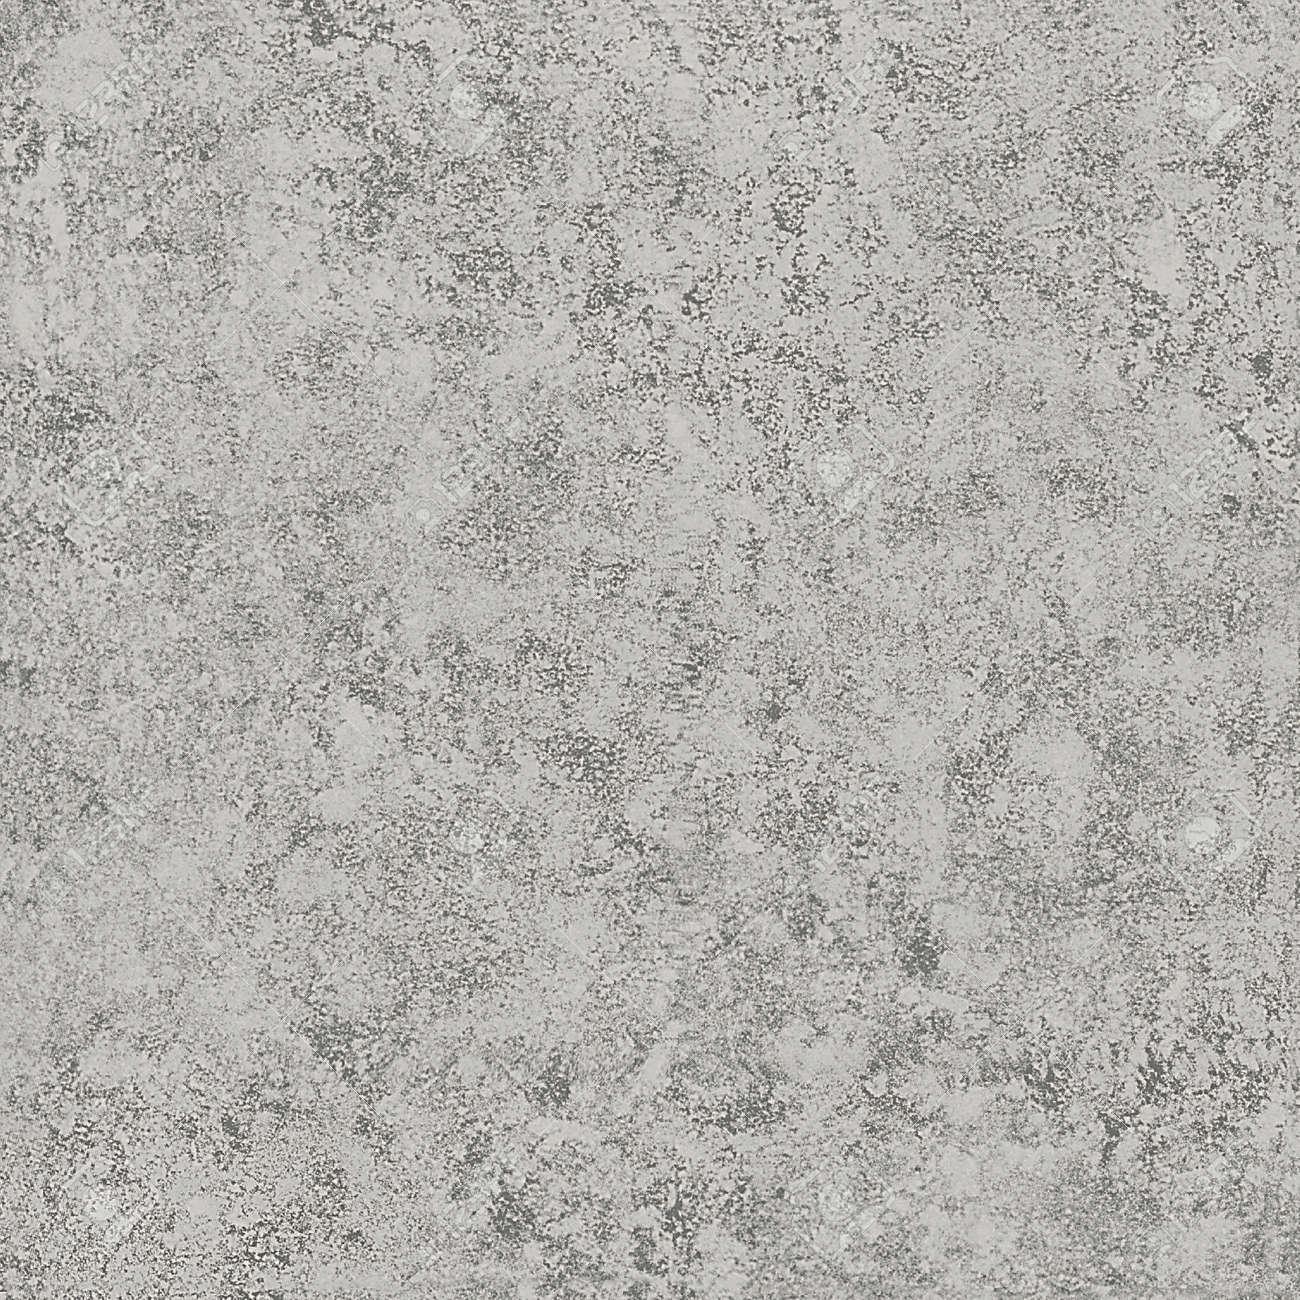 Piedra De Mármol Textura De Exploración De Impresión De Alta Resolución